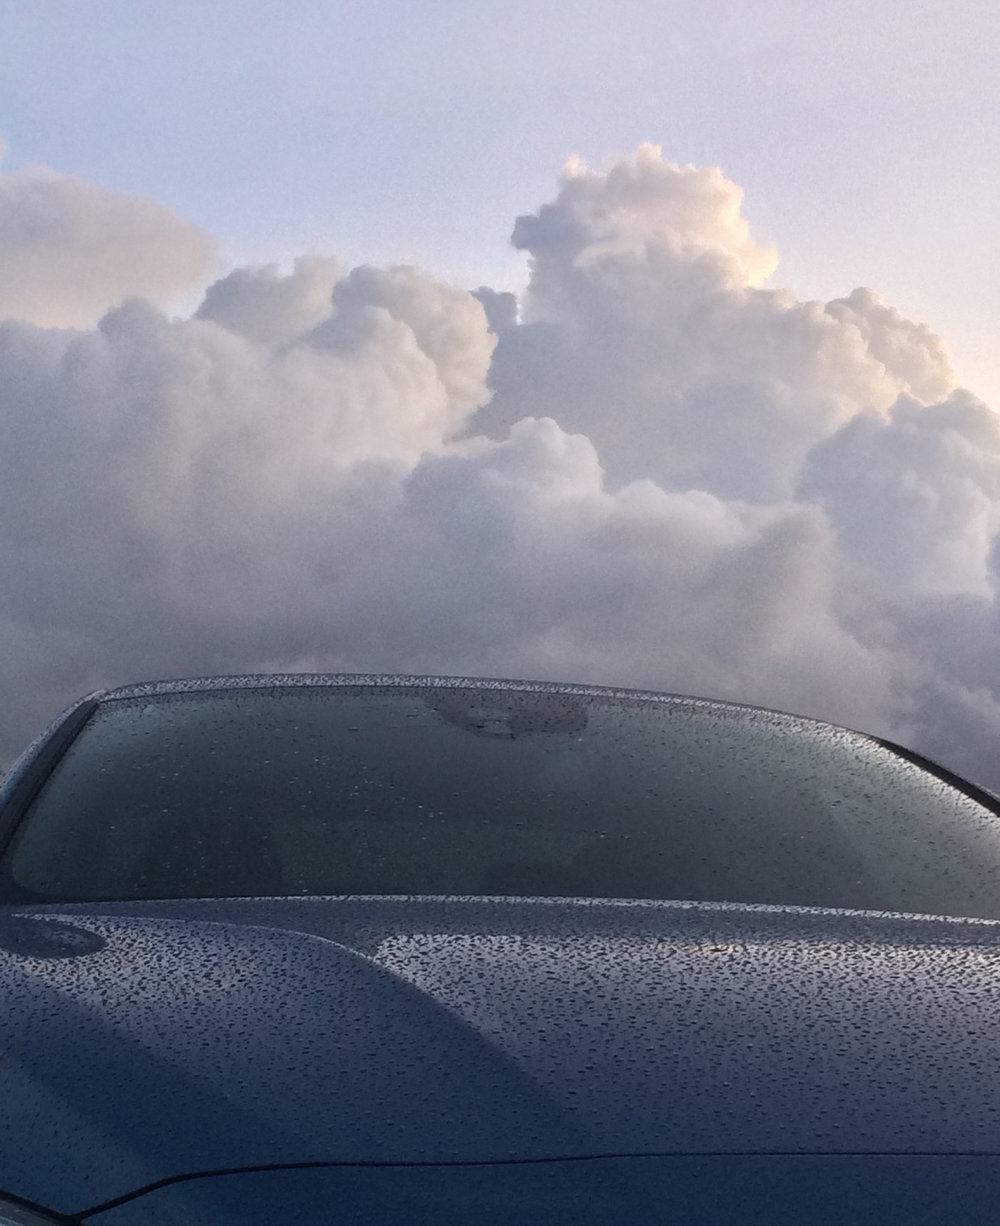 Volvo-Sky-1-web3.jpg